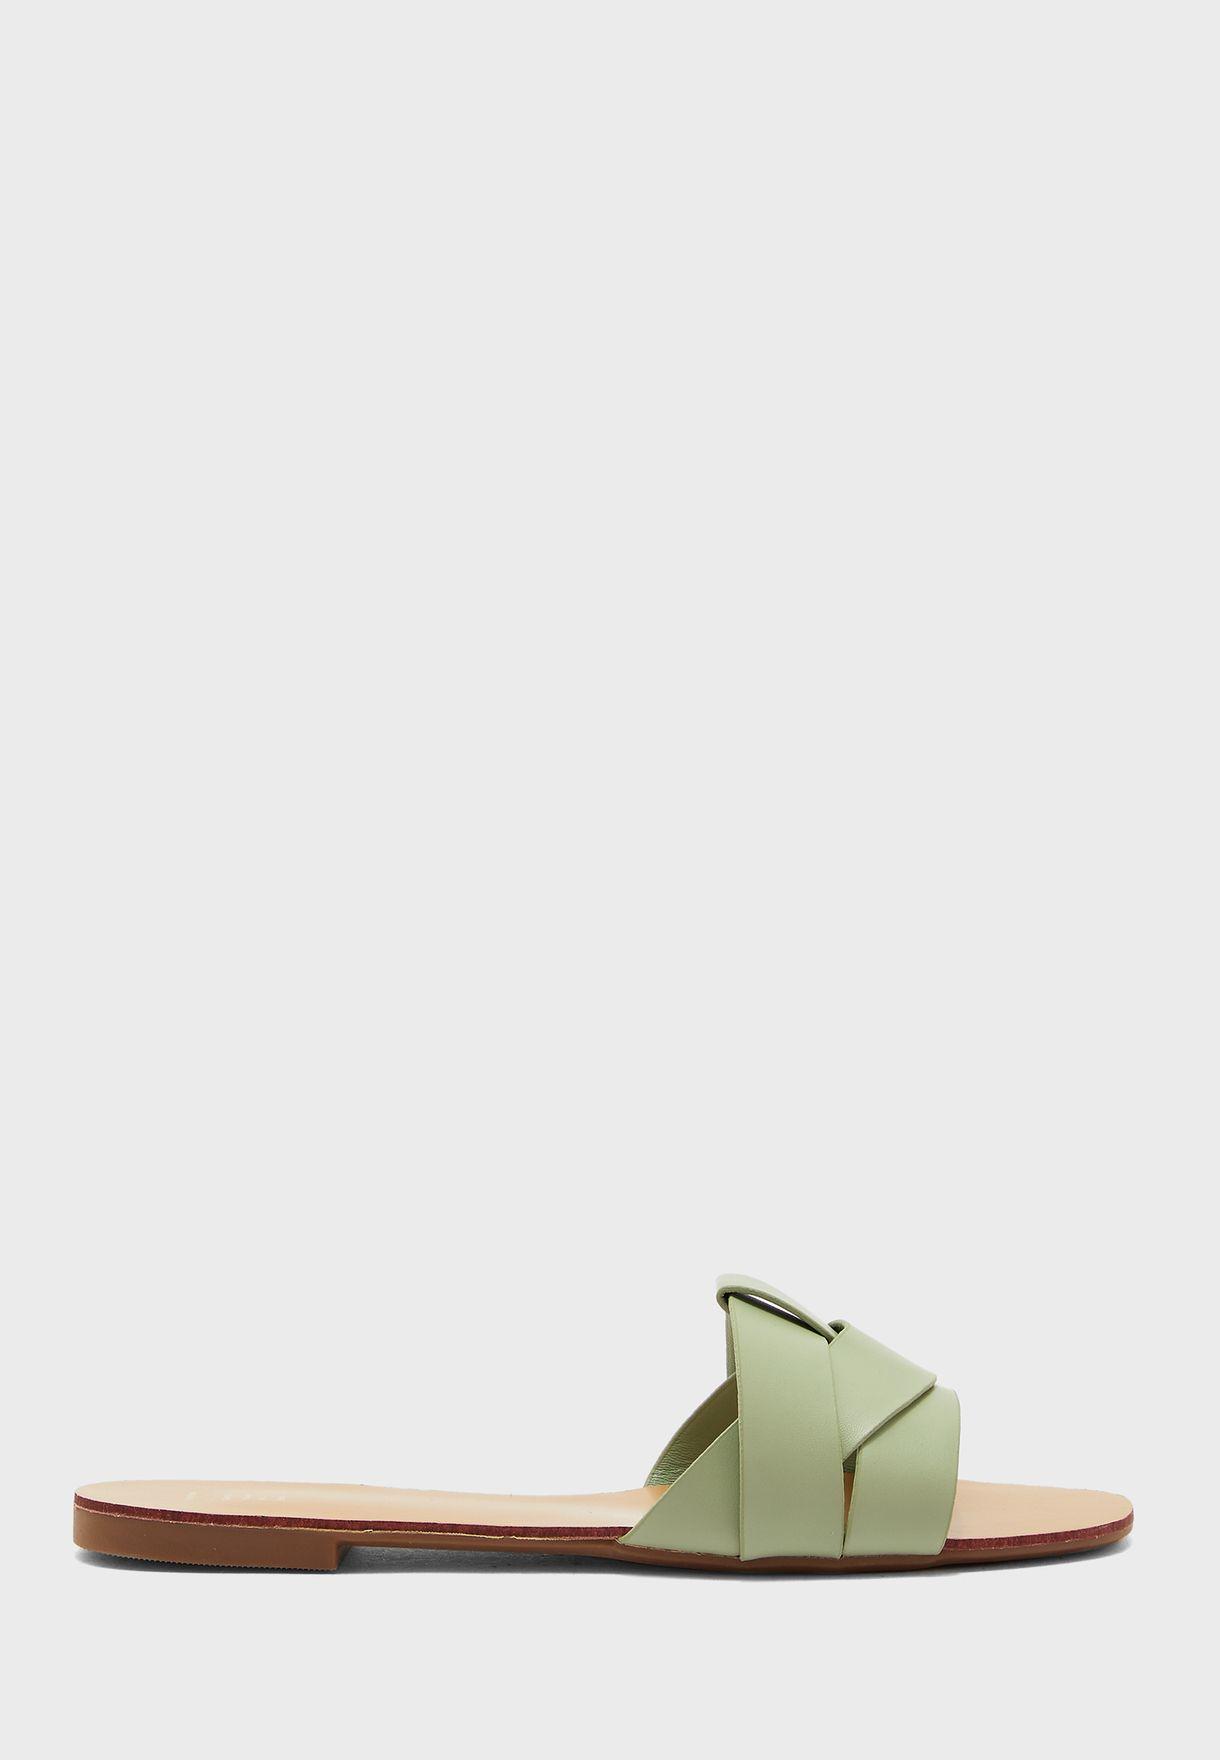 Woven Design Flat Sandal